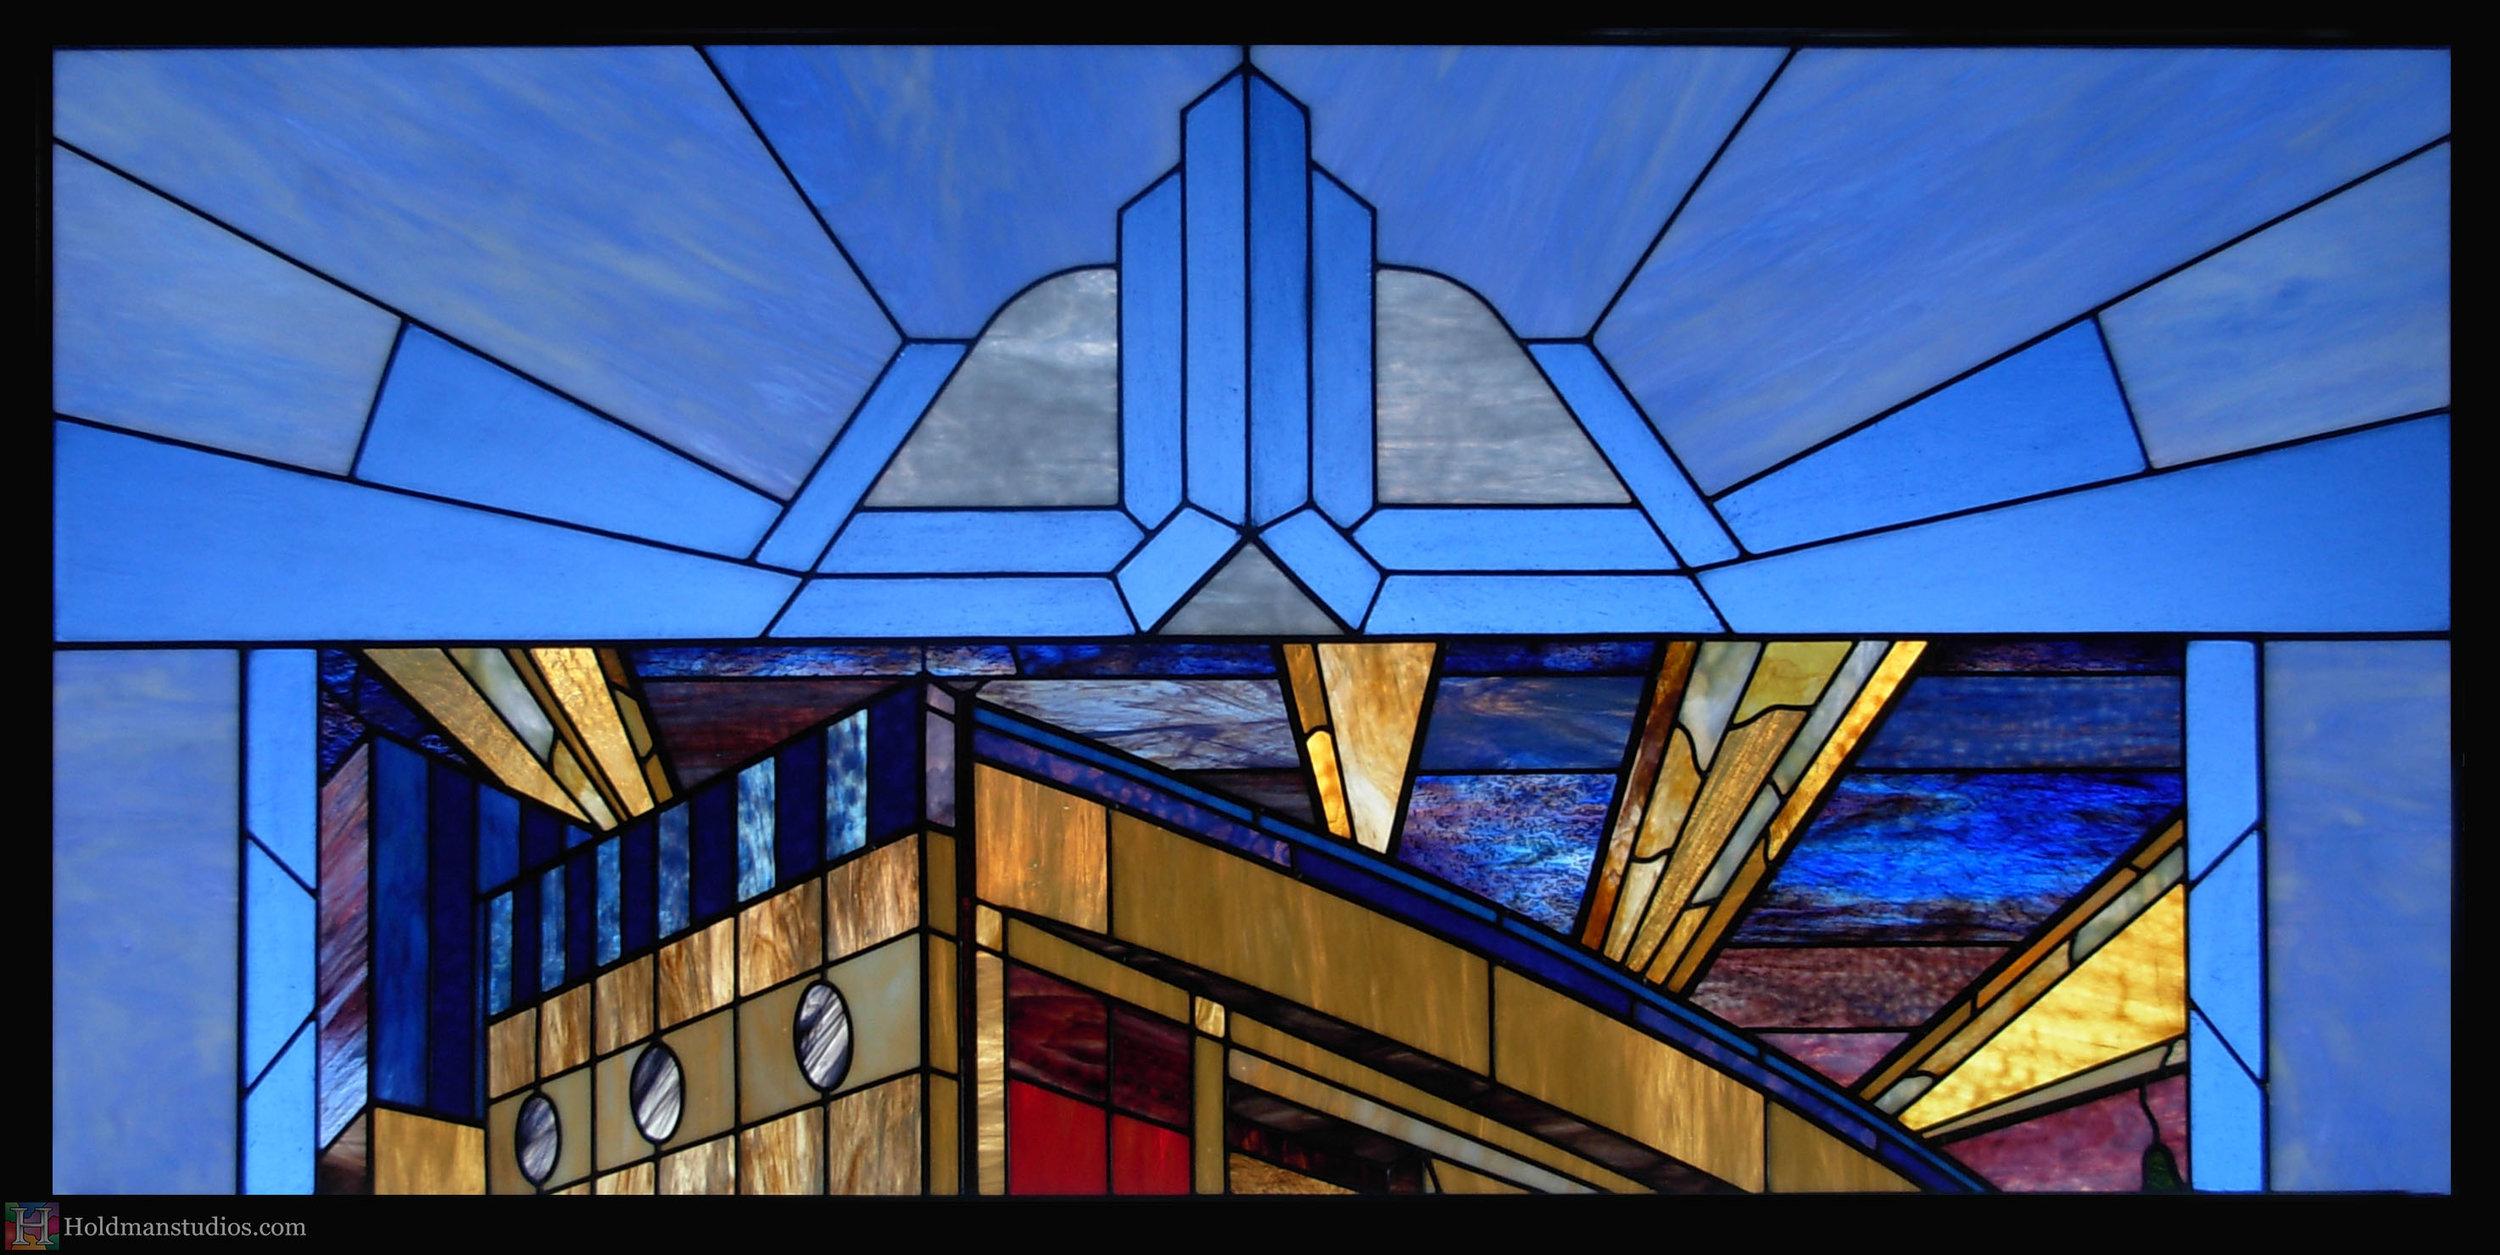 Holdman-studios-stained-art-glass-window-scera-theater-top-art-deco-crop.jpg